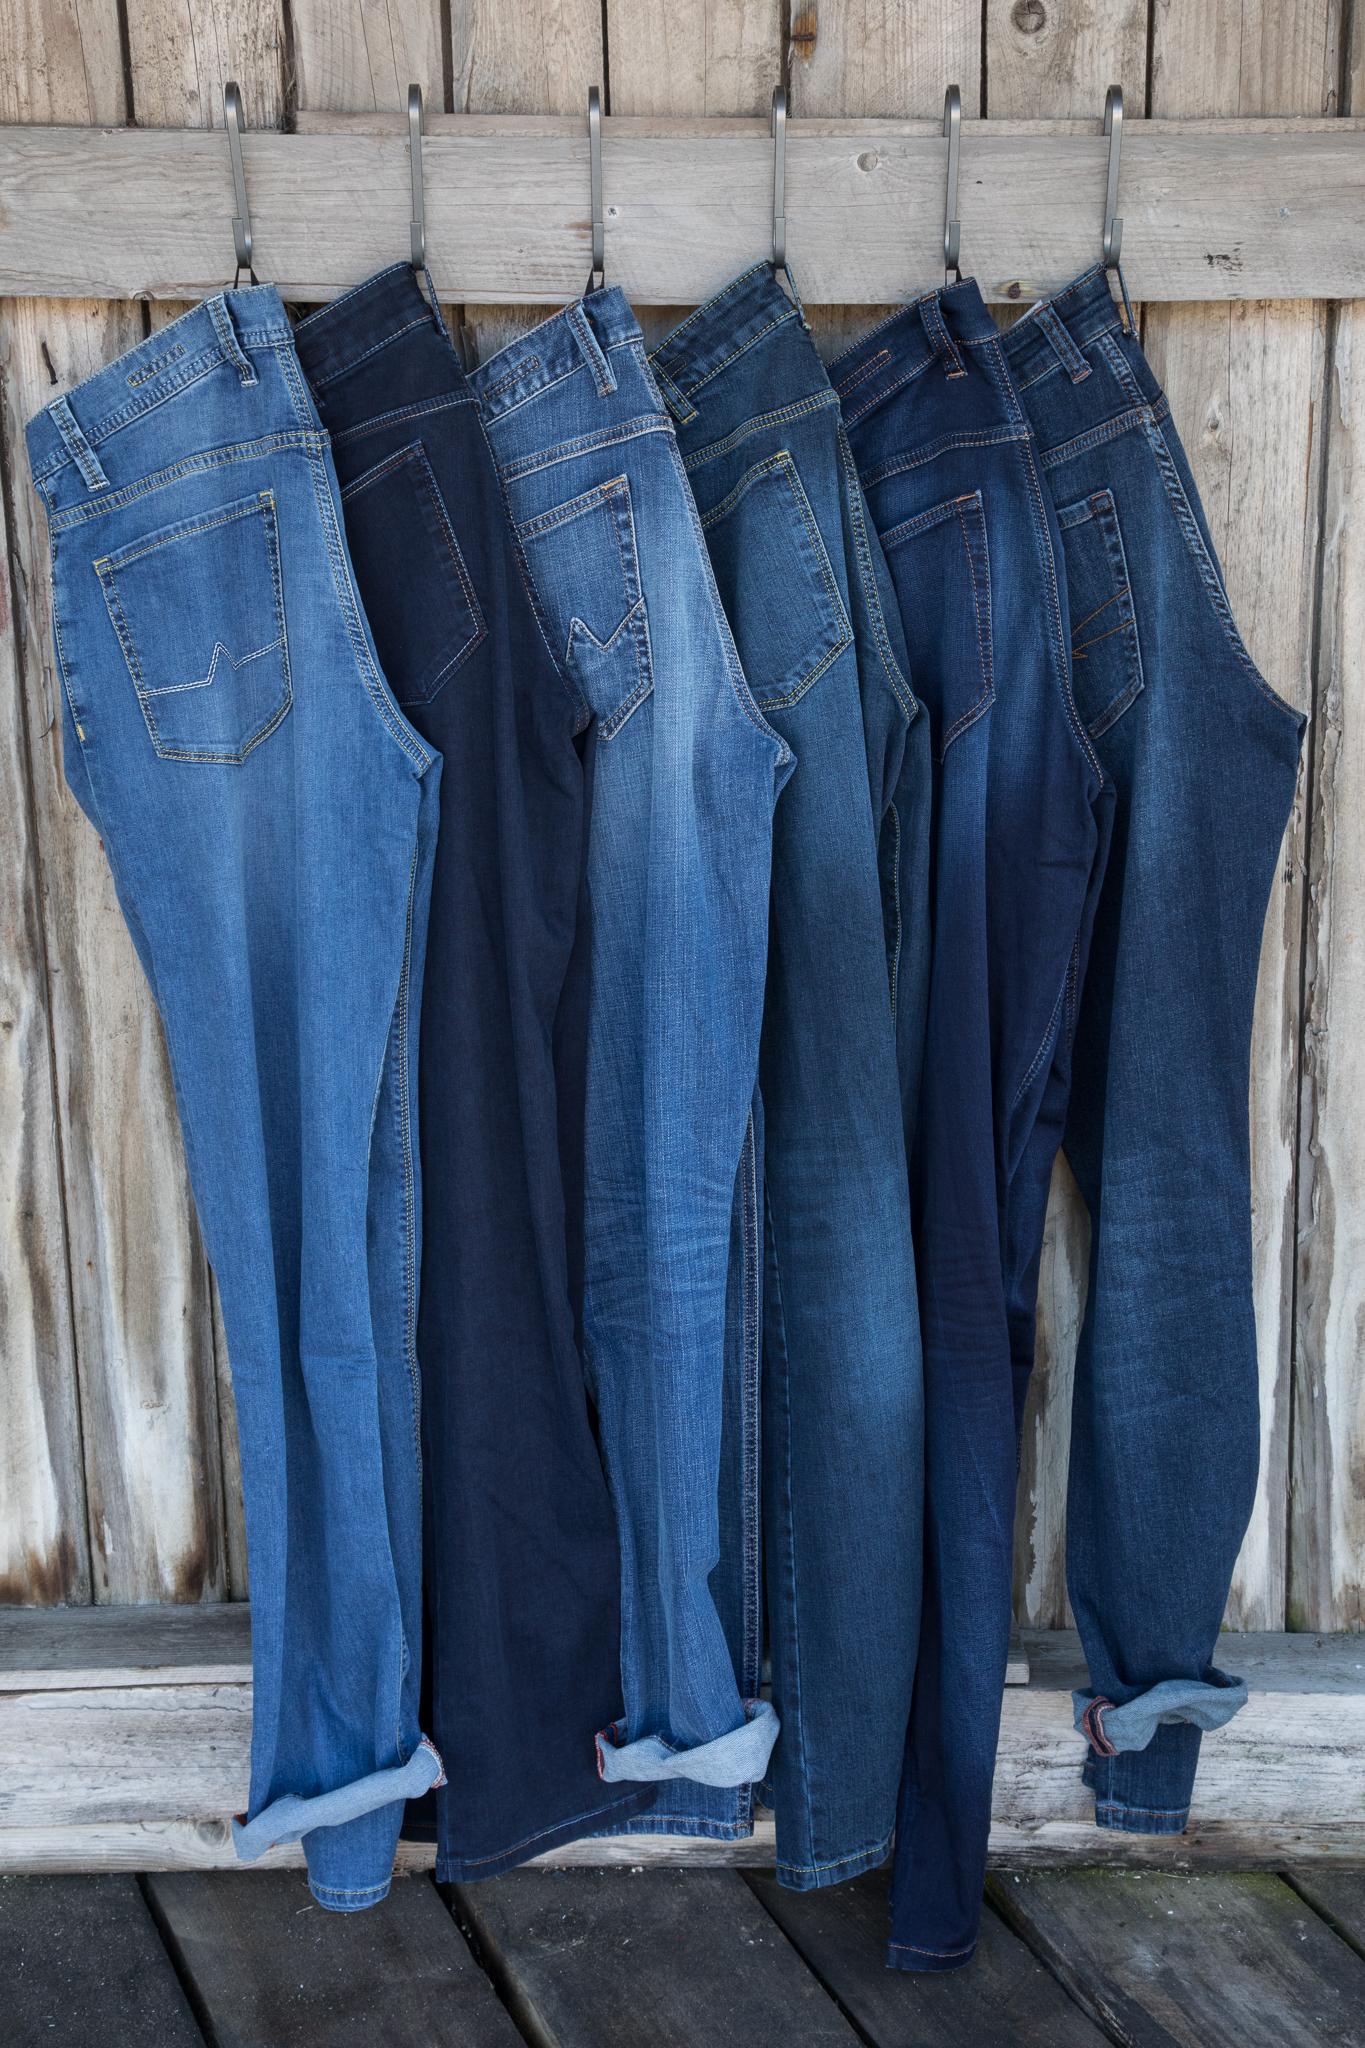 P.jeans-1-3.jpg